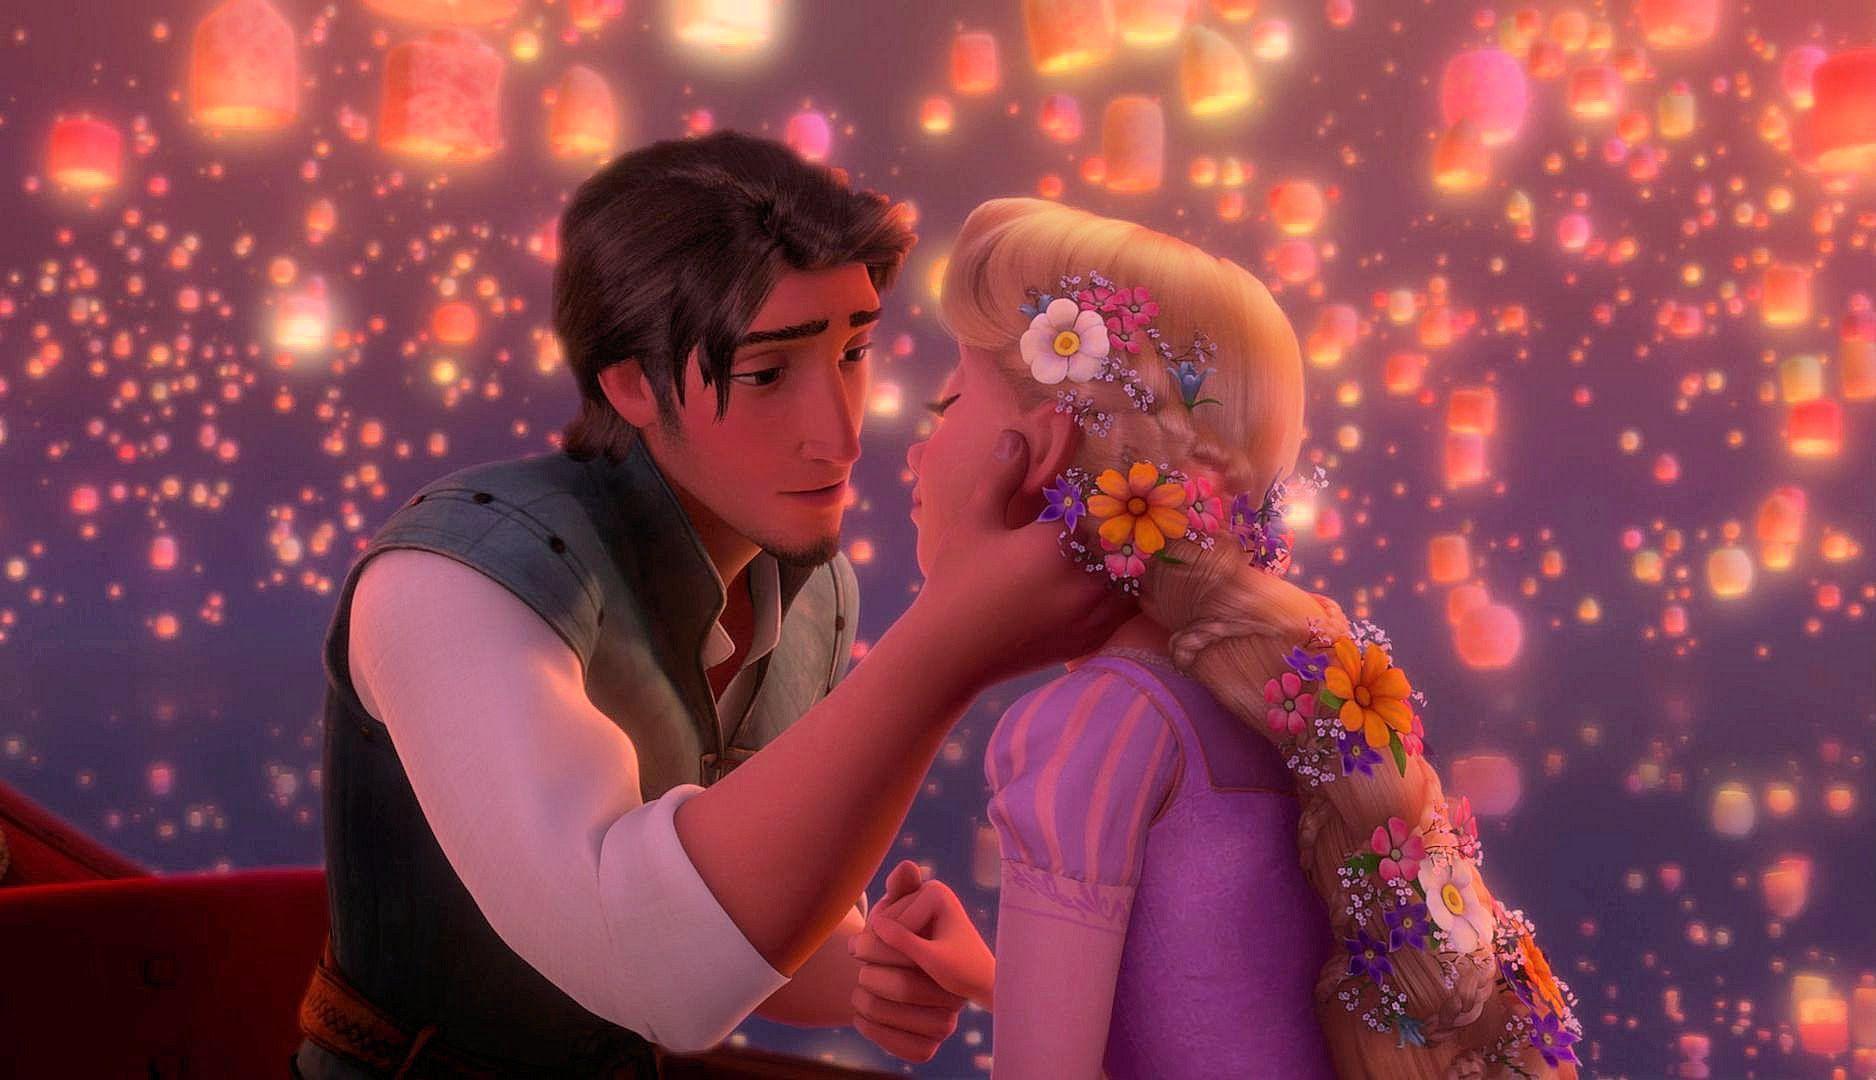 Rapunzel Film Completo In Italiano Cartone Animato Italiano Disney Disney Principesse Disney Cartoni Disney